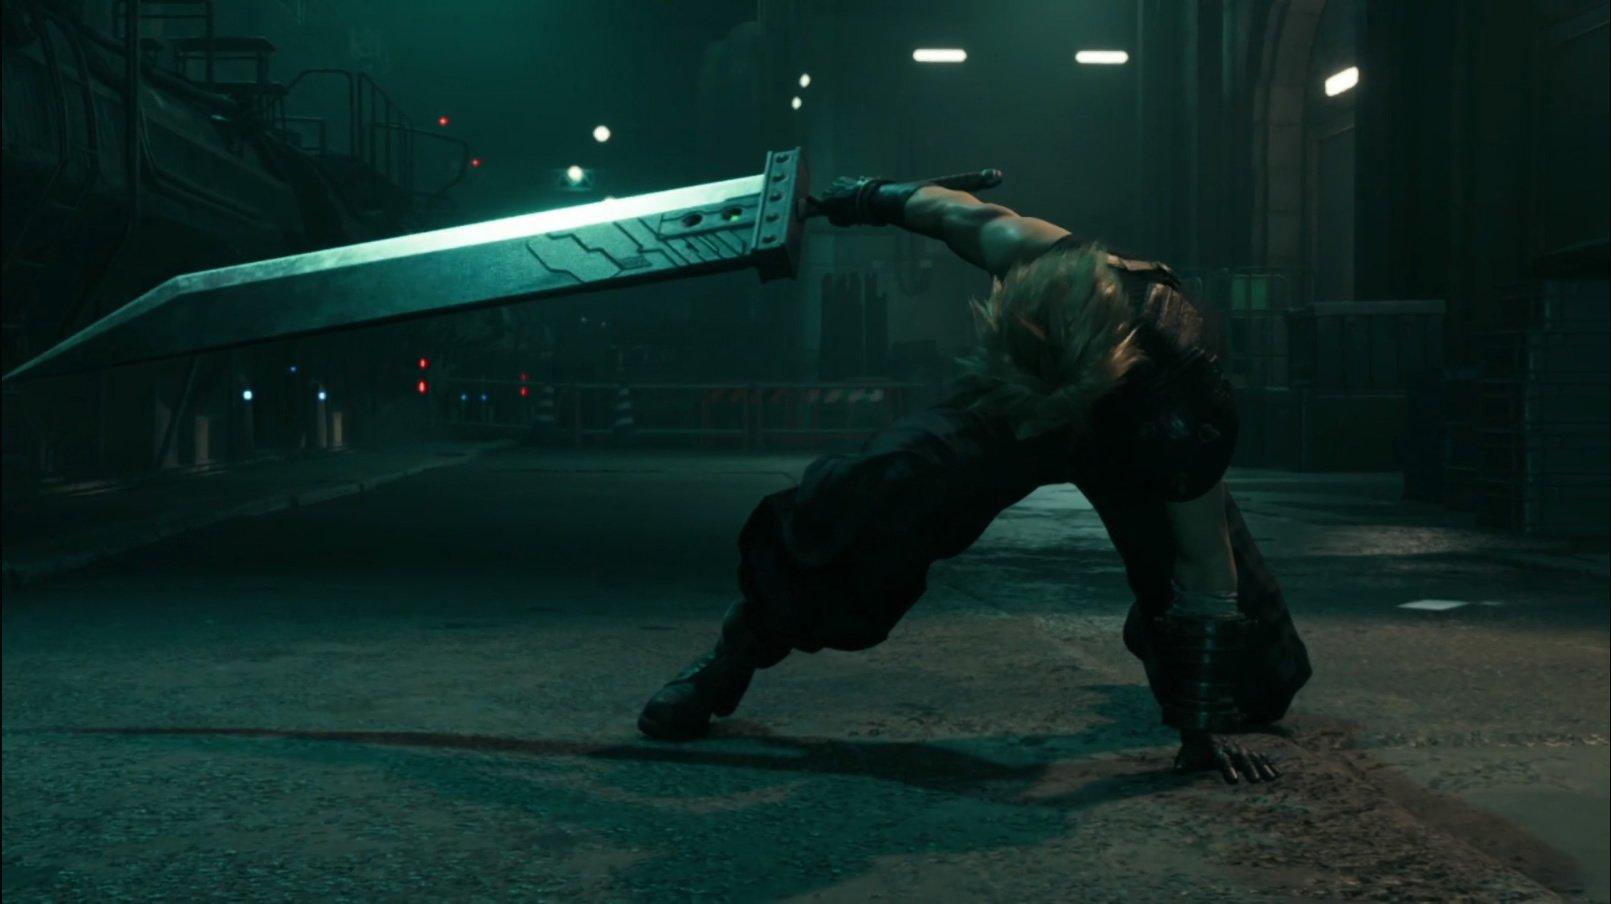 Final Fantasy VII Remake demo: How to unlock the secret ending thumbnail